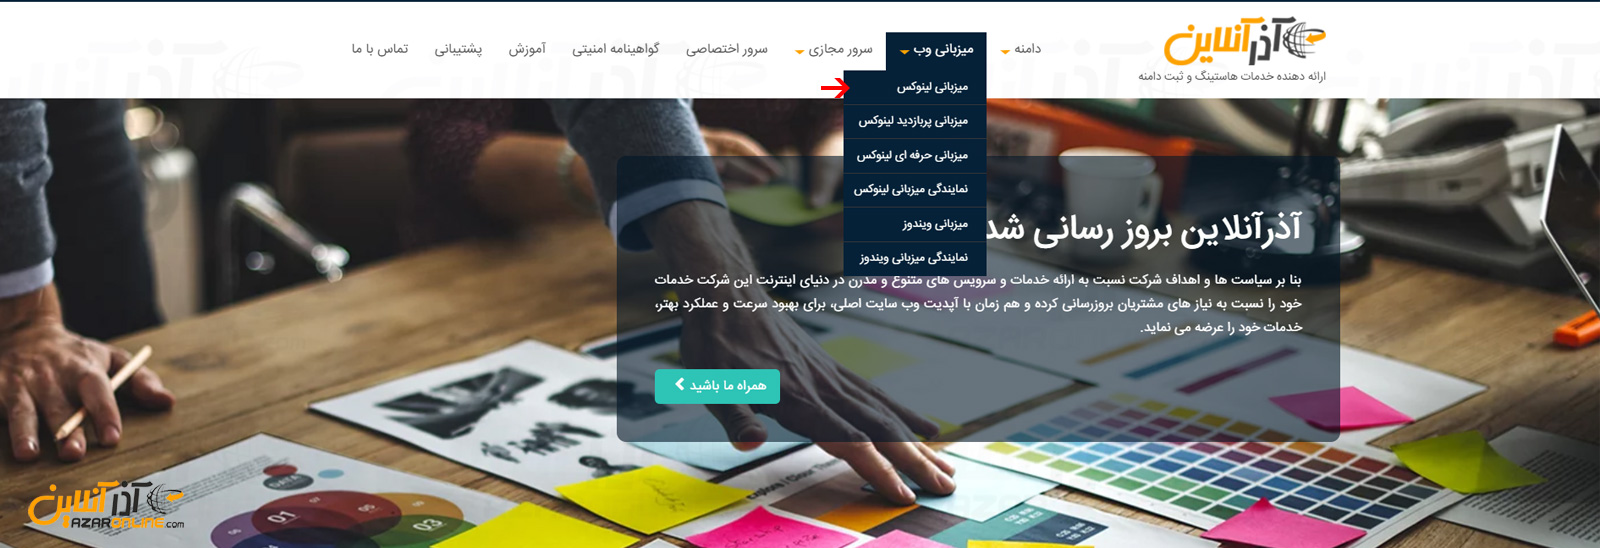 انتخاب منوی میزبانی وب لینوکس